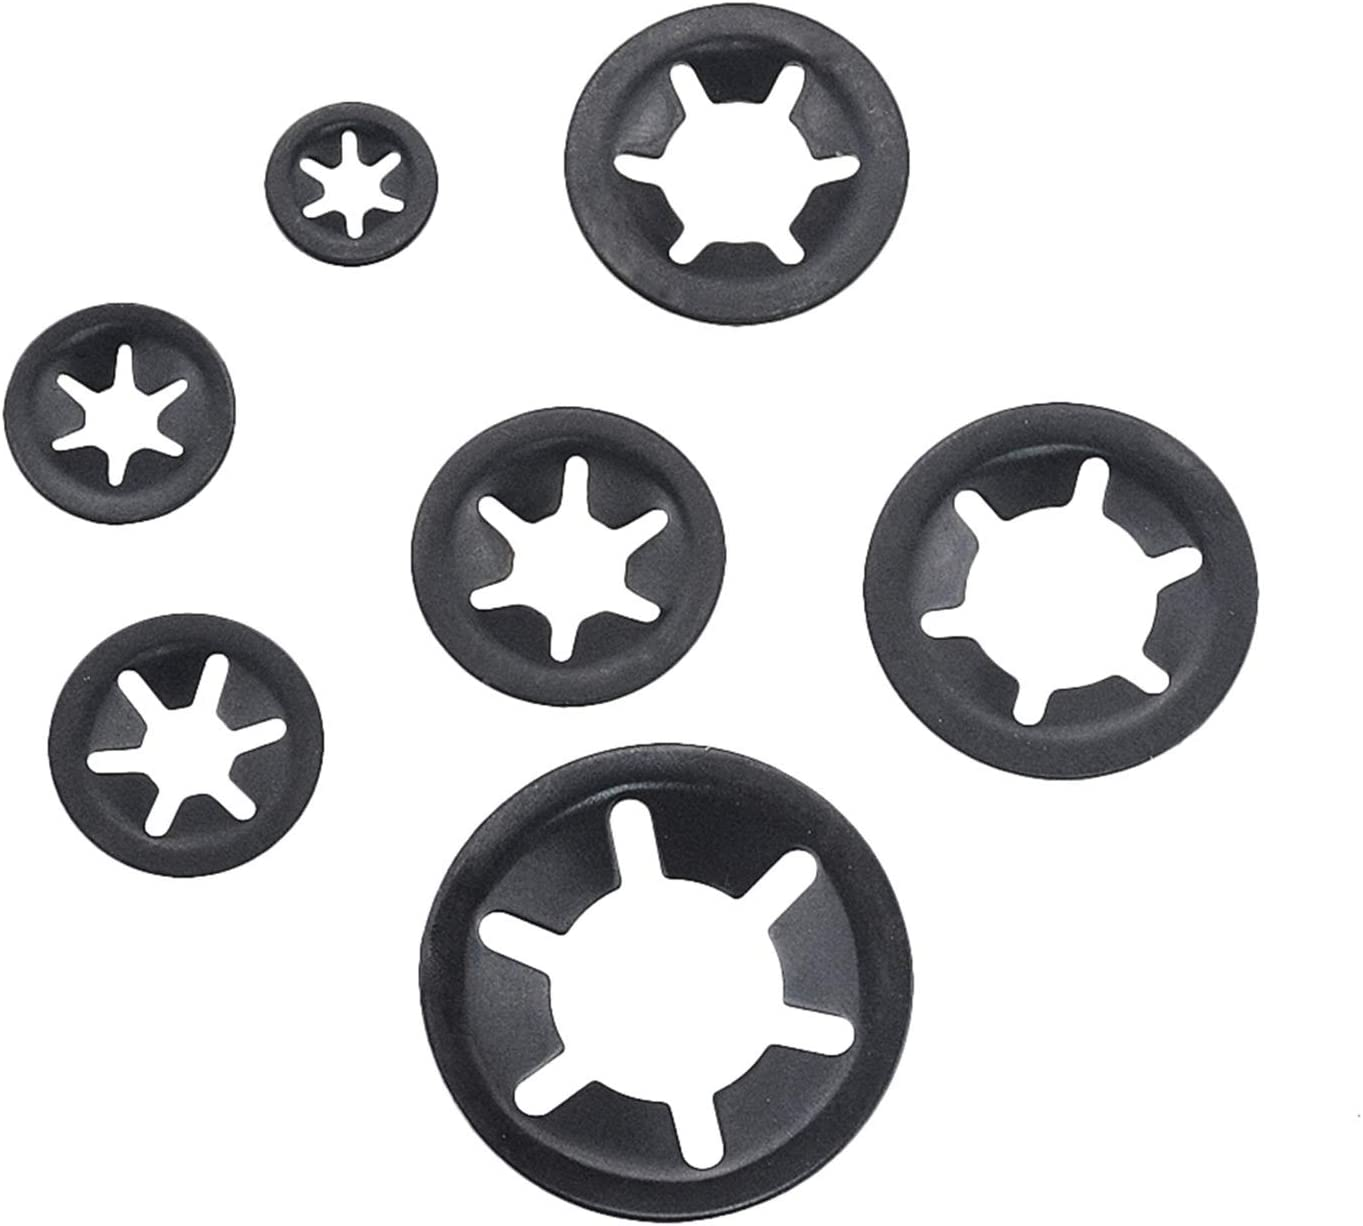 DShanLa 260PCS//Box M3-12 Set Manganese Steel Push On Washer Retaining Lock Internal Tooth Star Lock Washers Set Fasteners Assortment Kit DShanLa